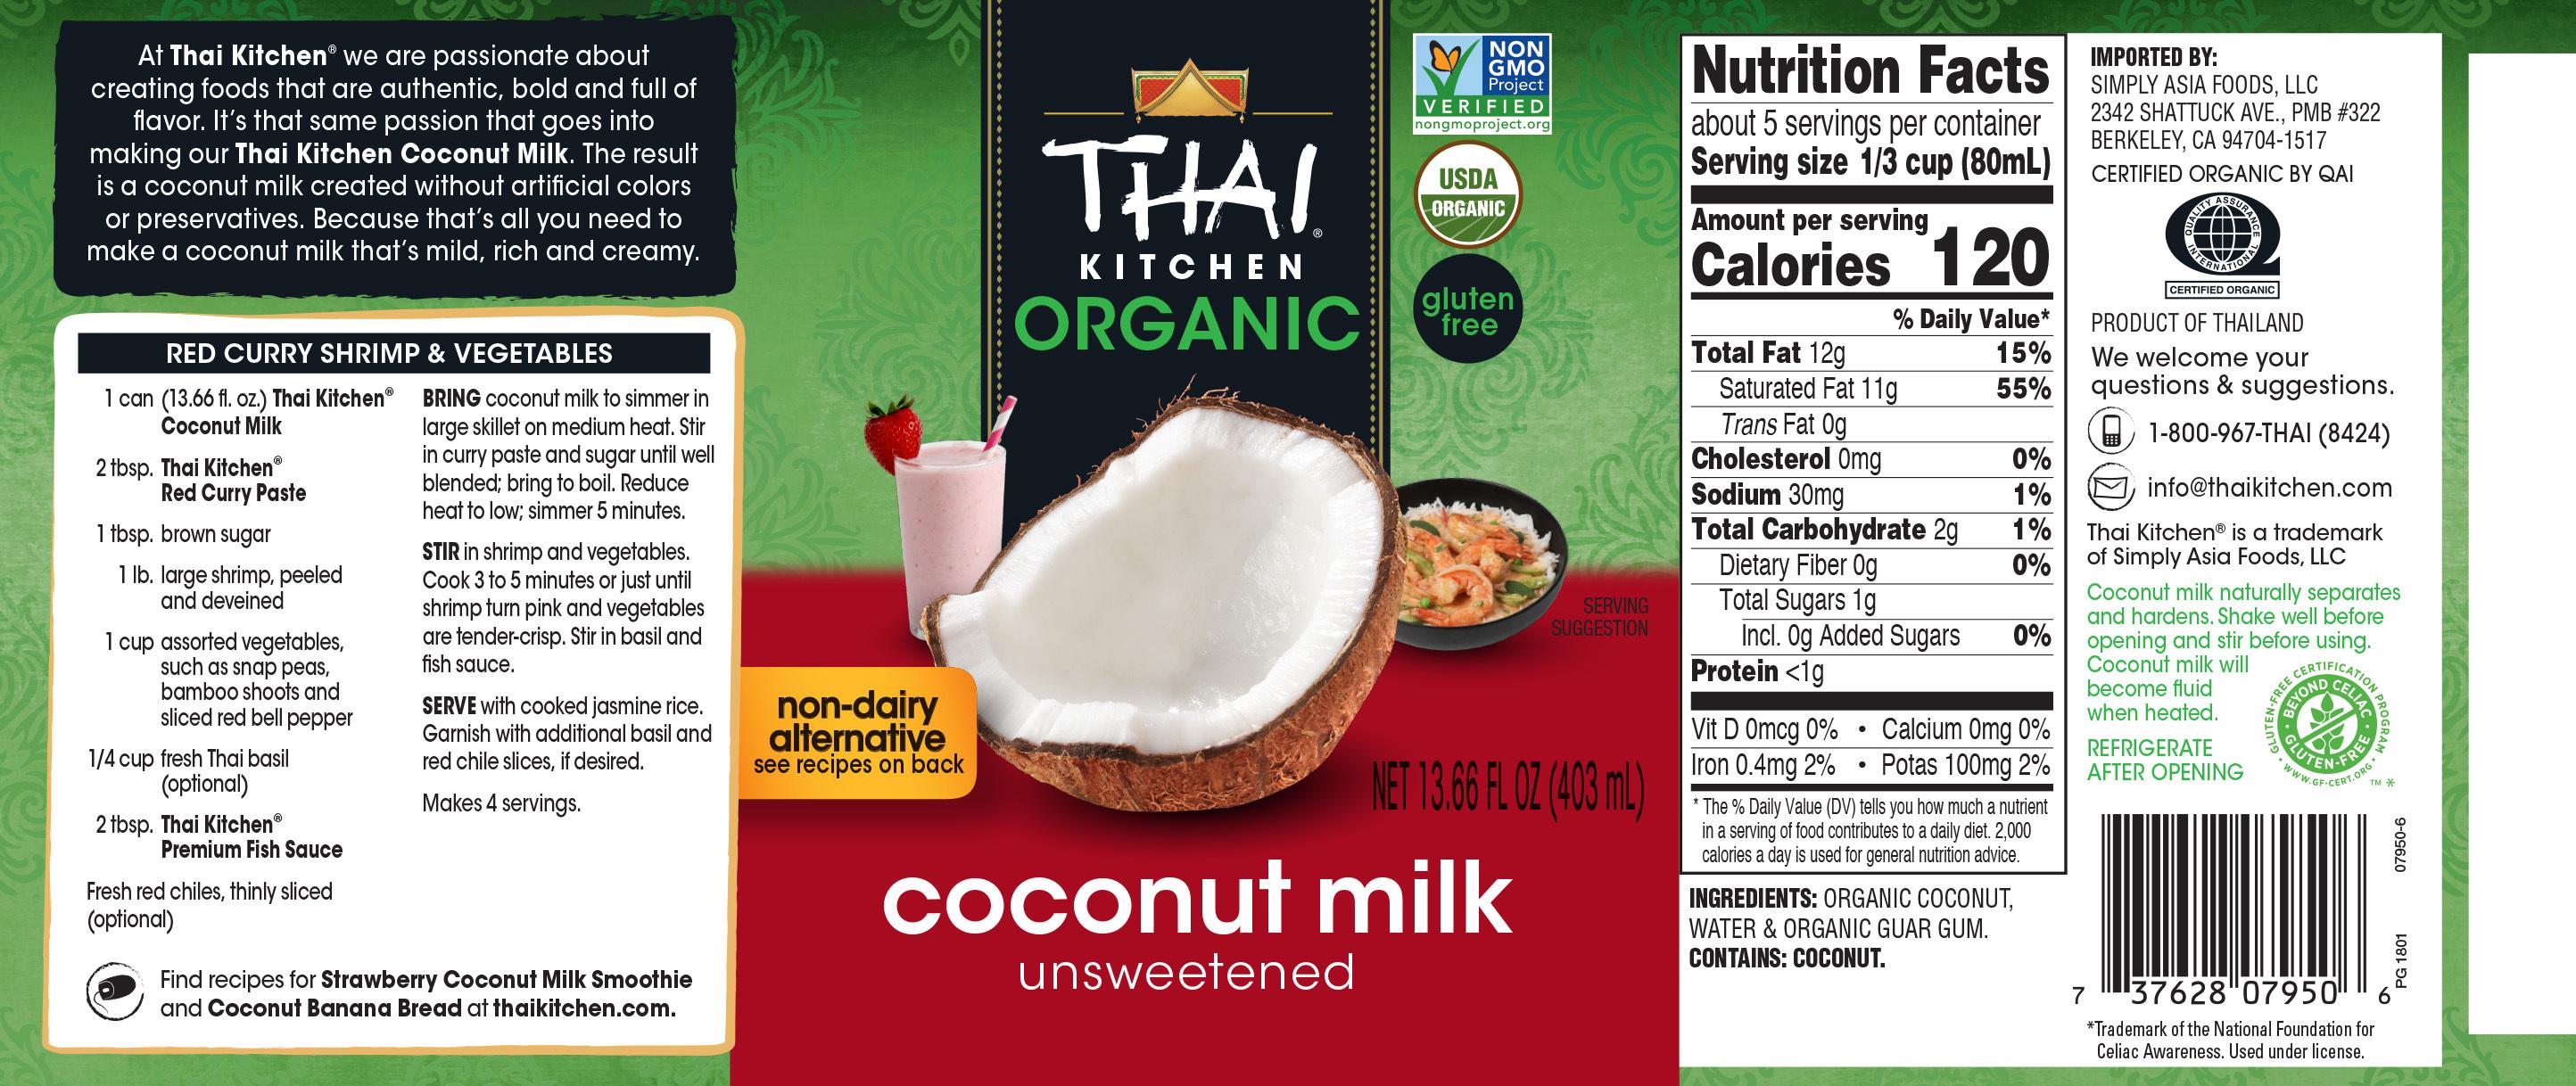 Organic Coconut Milk Organic Coconut Milk